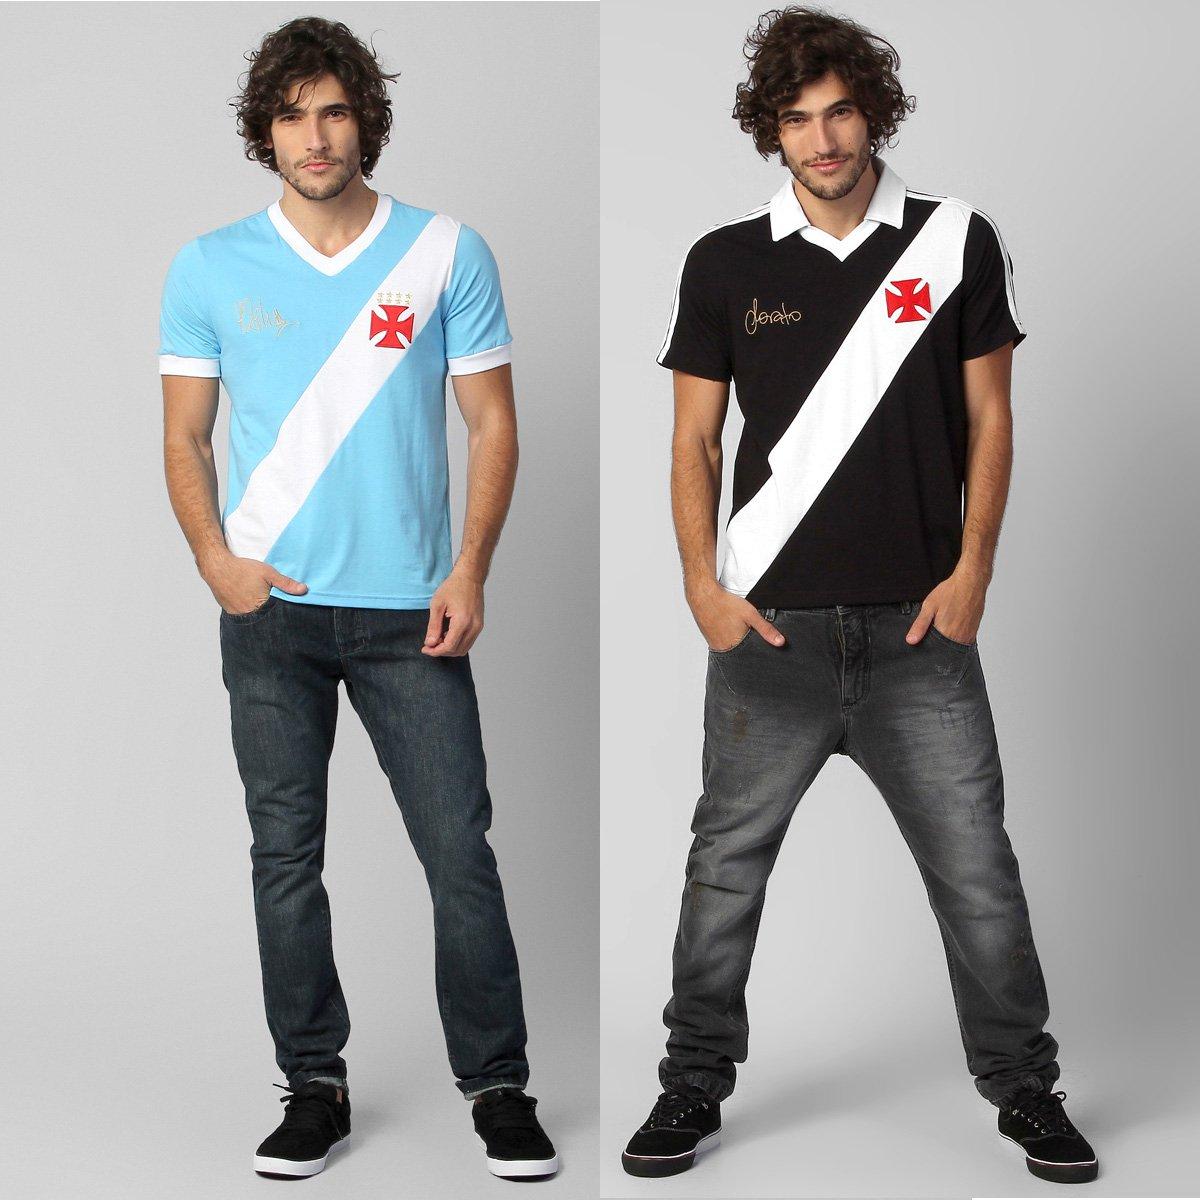 6e2f8ce7b6 Kit Vasco - Camisa Retrô Sorato + Camiseta Martin Silva